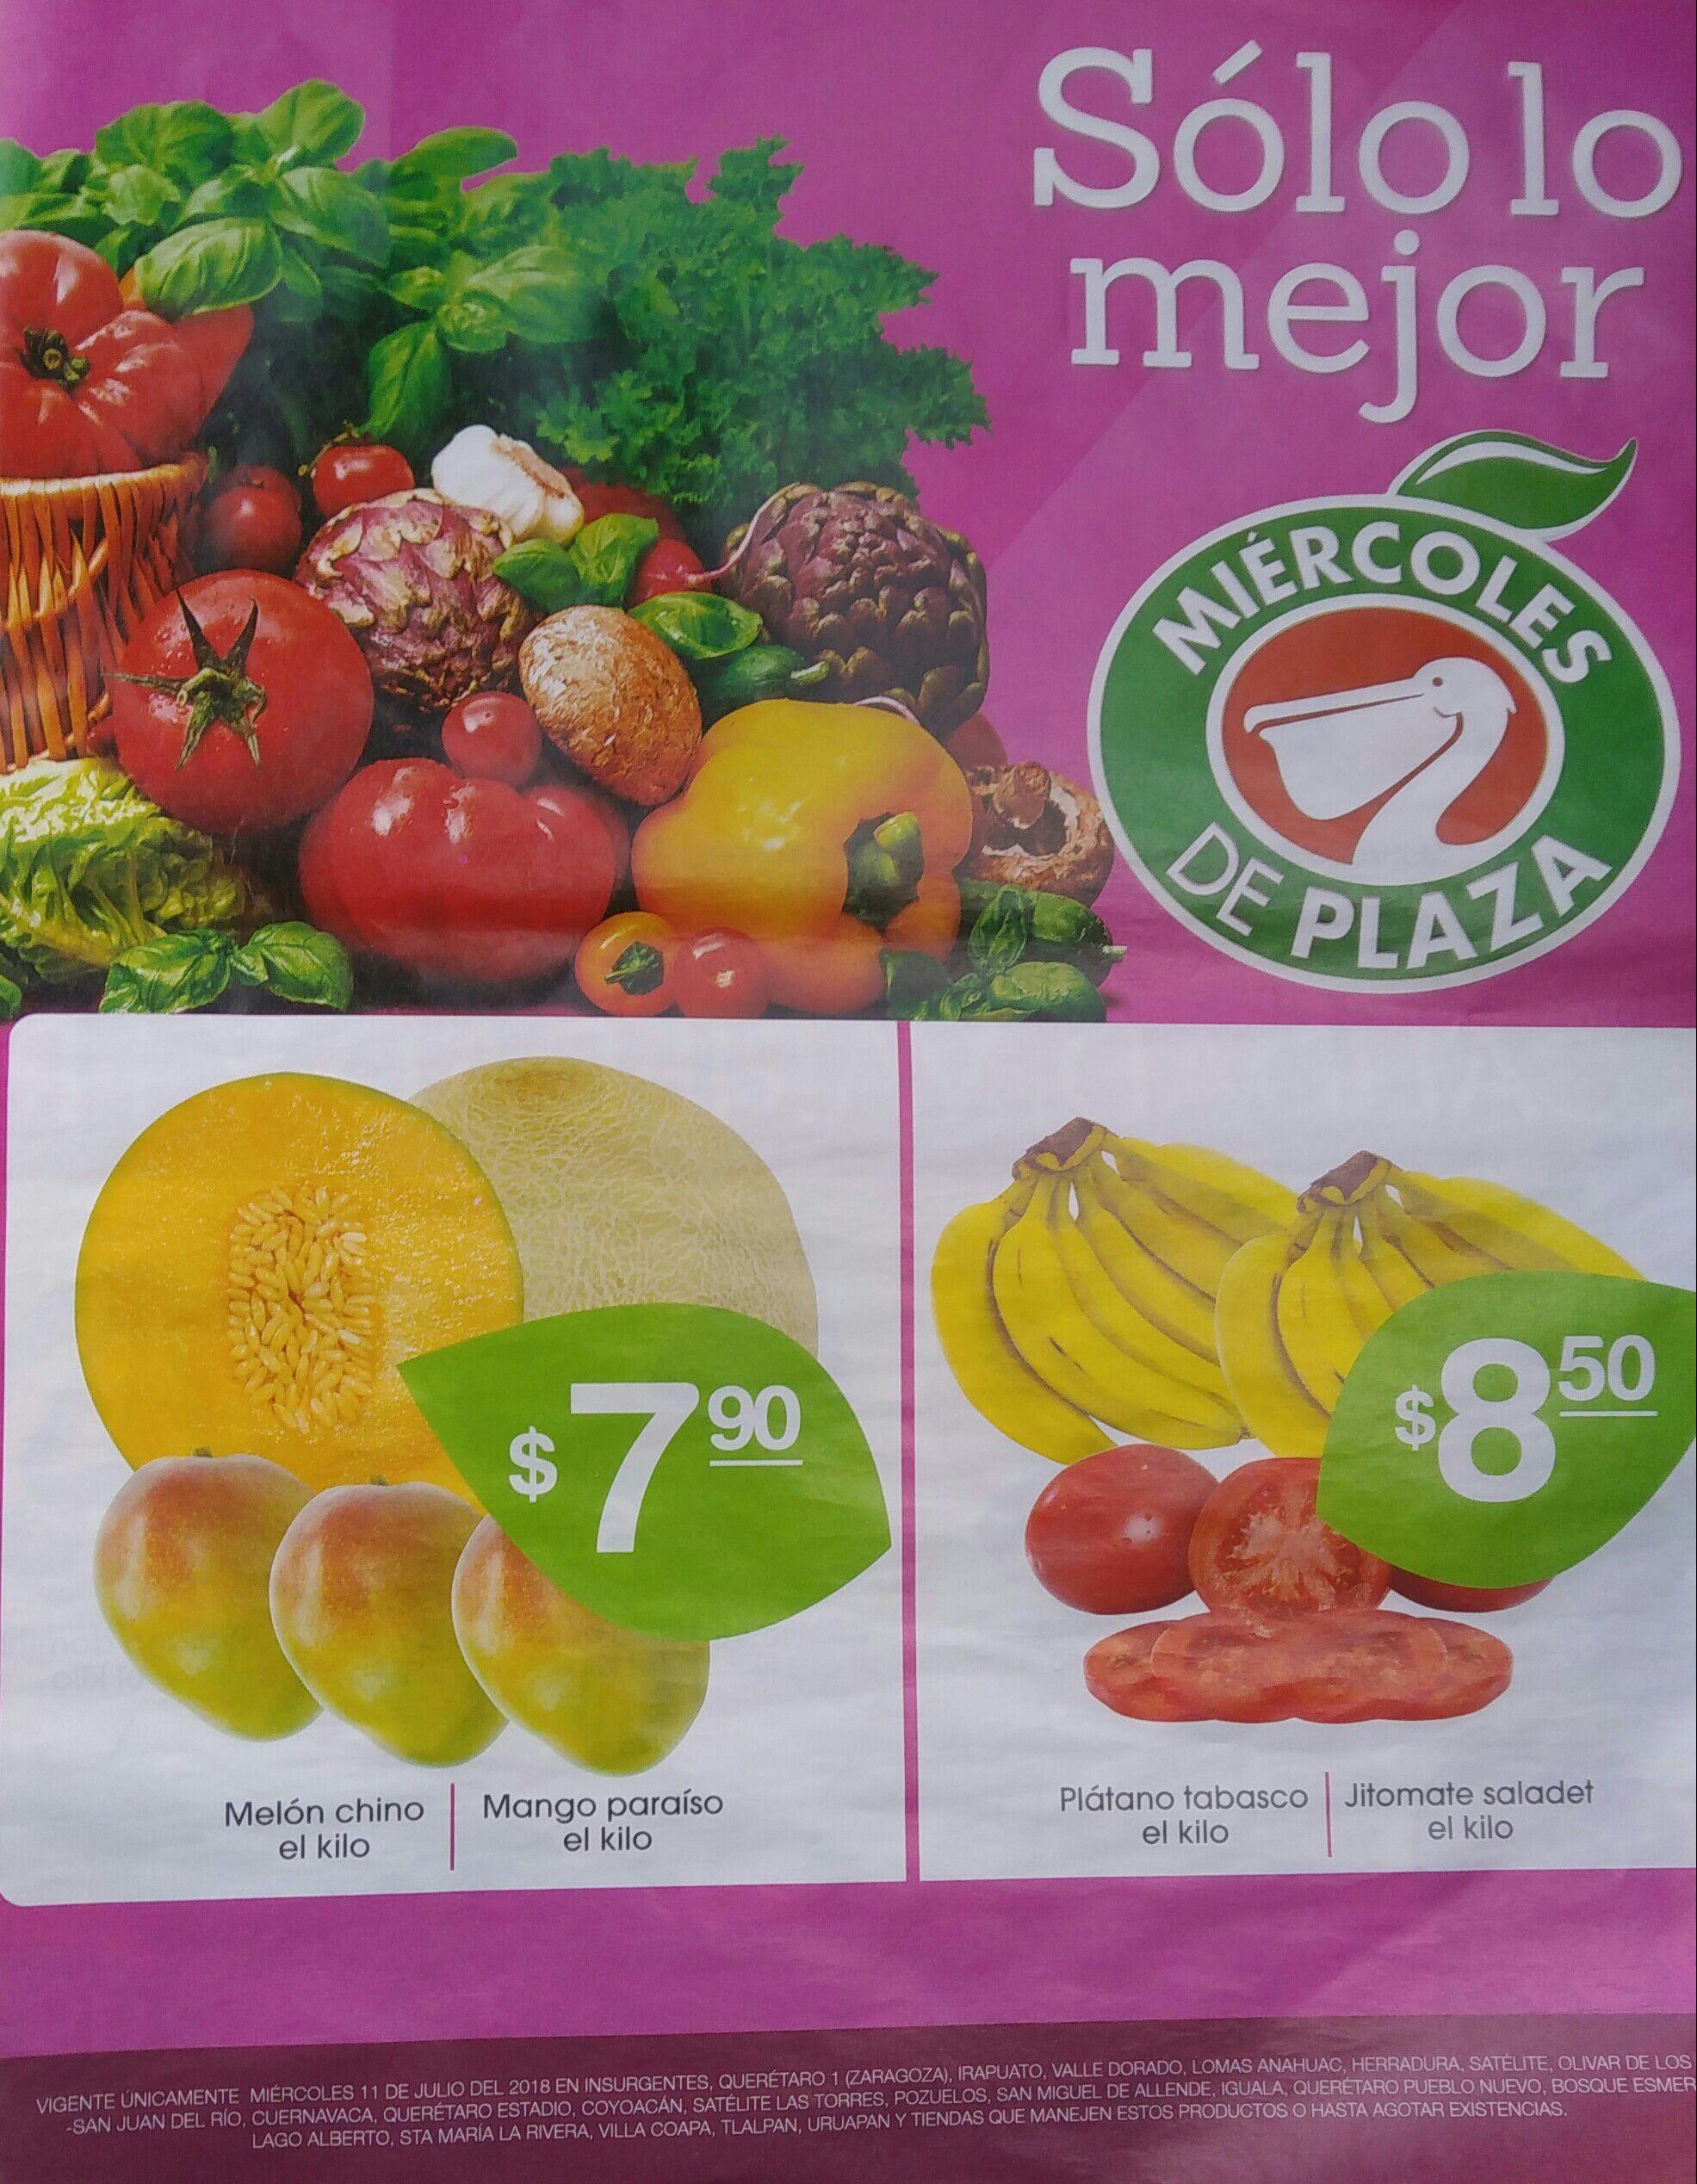 La Comer y Fresko: Miércoles de Plaza 11 Julio: Melón Chino $7.90 kg... Mango Paraíso $7.90 kg... Plátano Tabasco $8.50 kg... Jitomate Saladet $8.50 kg.